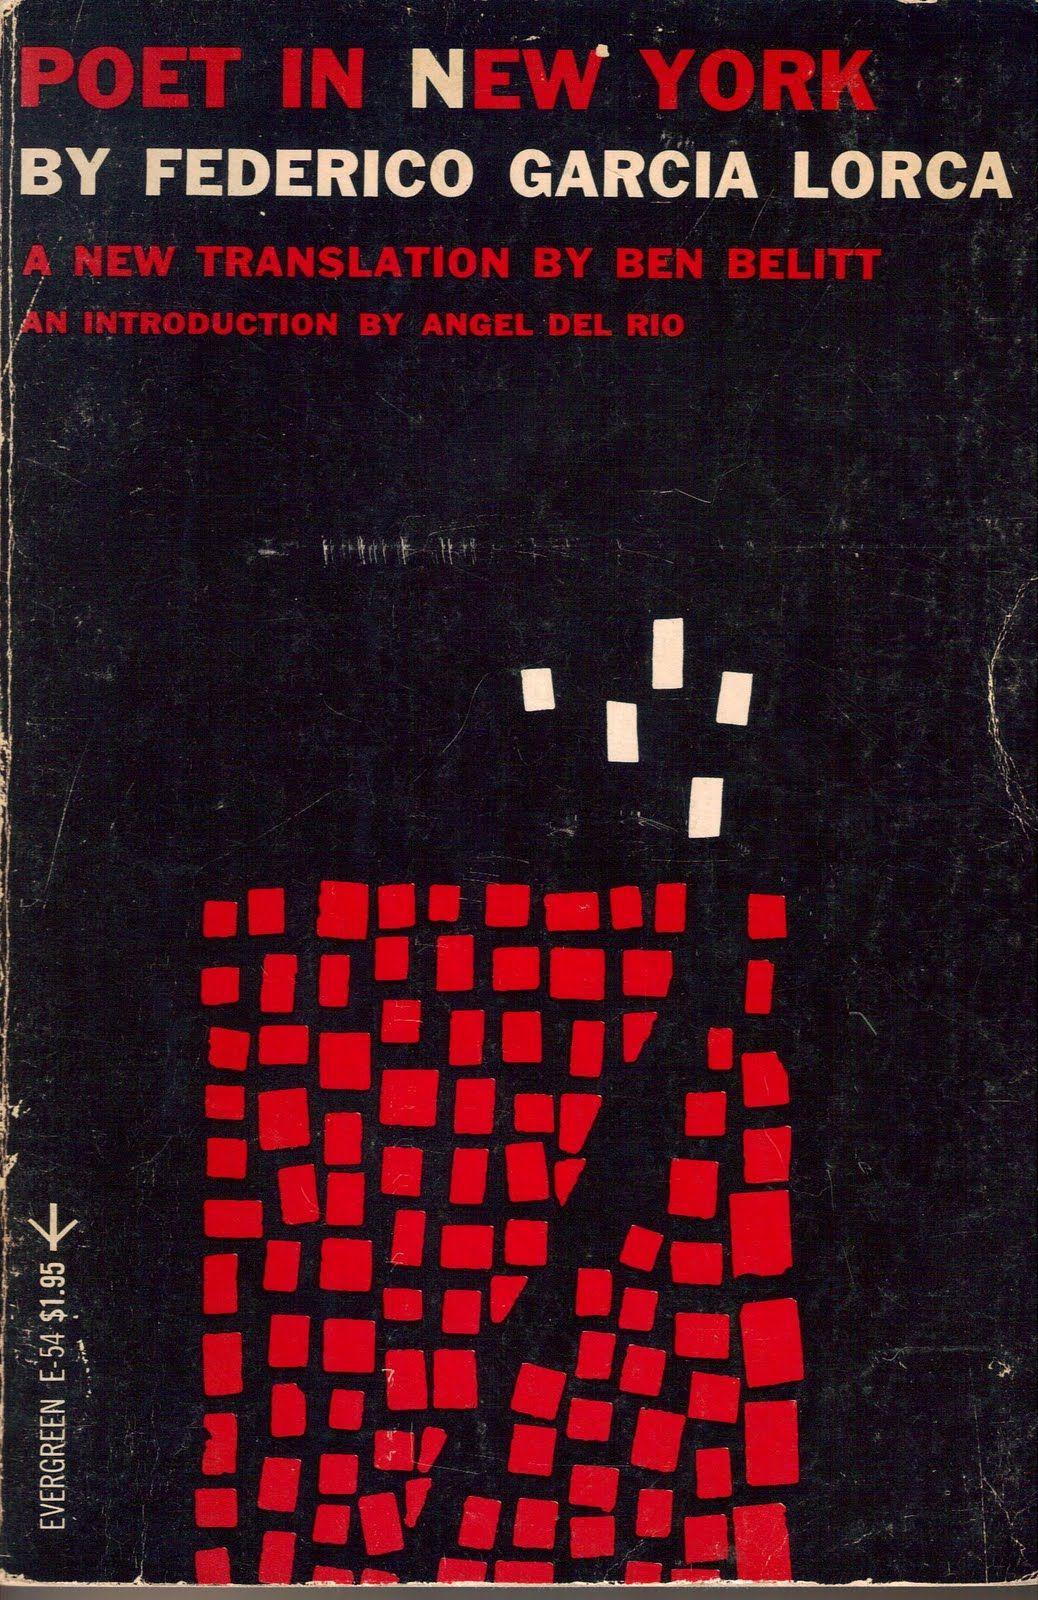 Poet in New York., Garcia Lorca, Federico (trans. Ben Belitt)